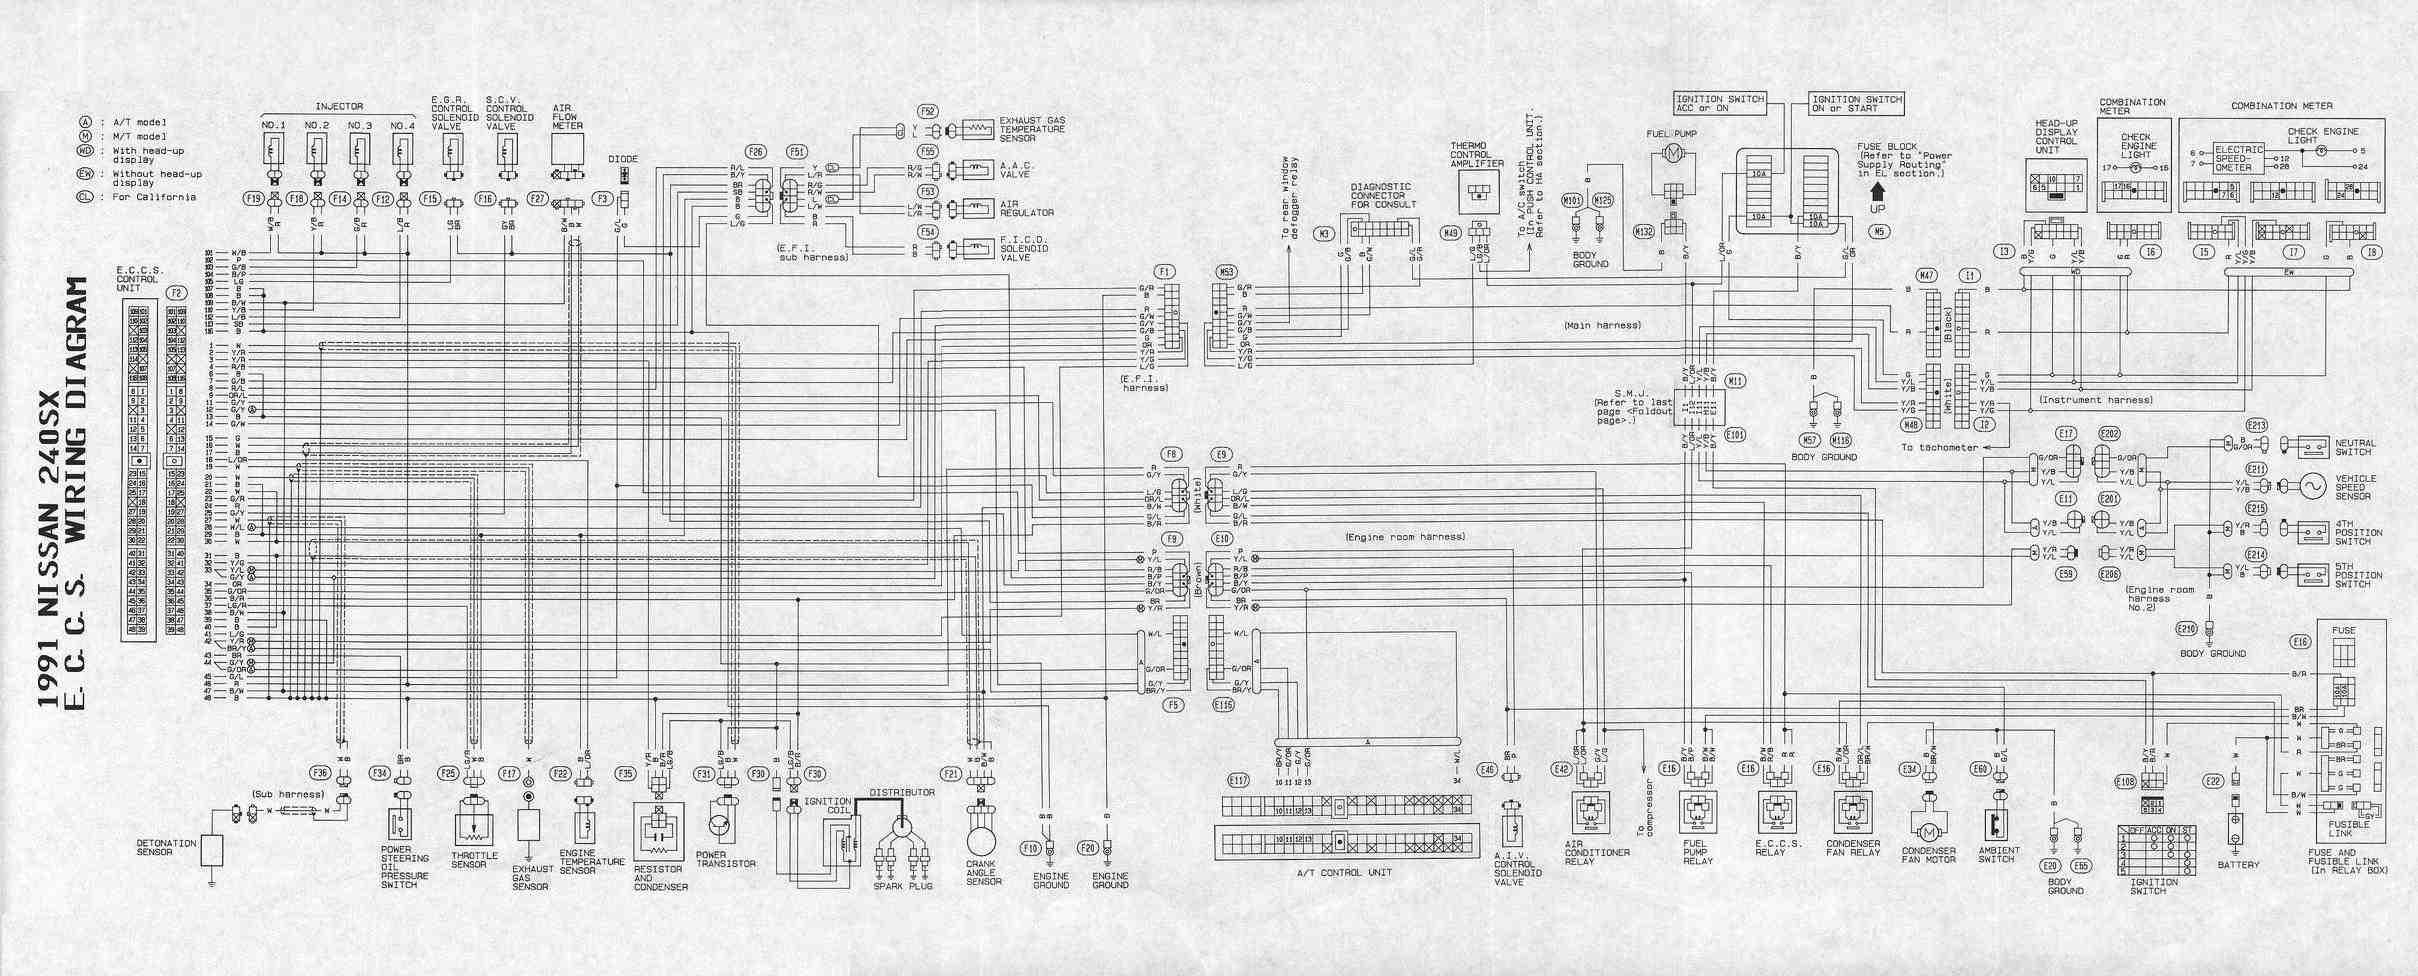 sr20det diagrams13 wiring diagram wiring diagram schematics sr20det ecu wires s13 silvia front end nissan wiring diagrams